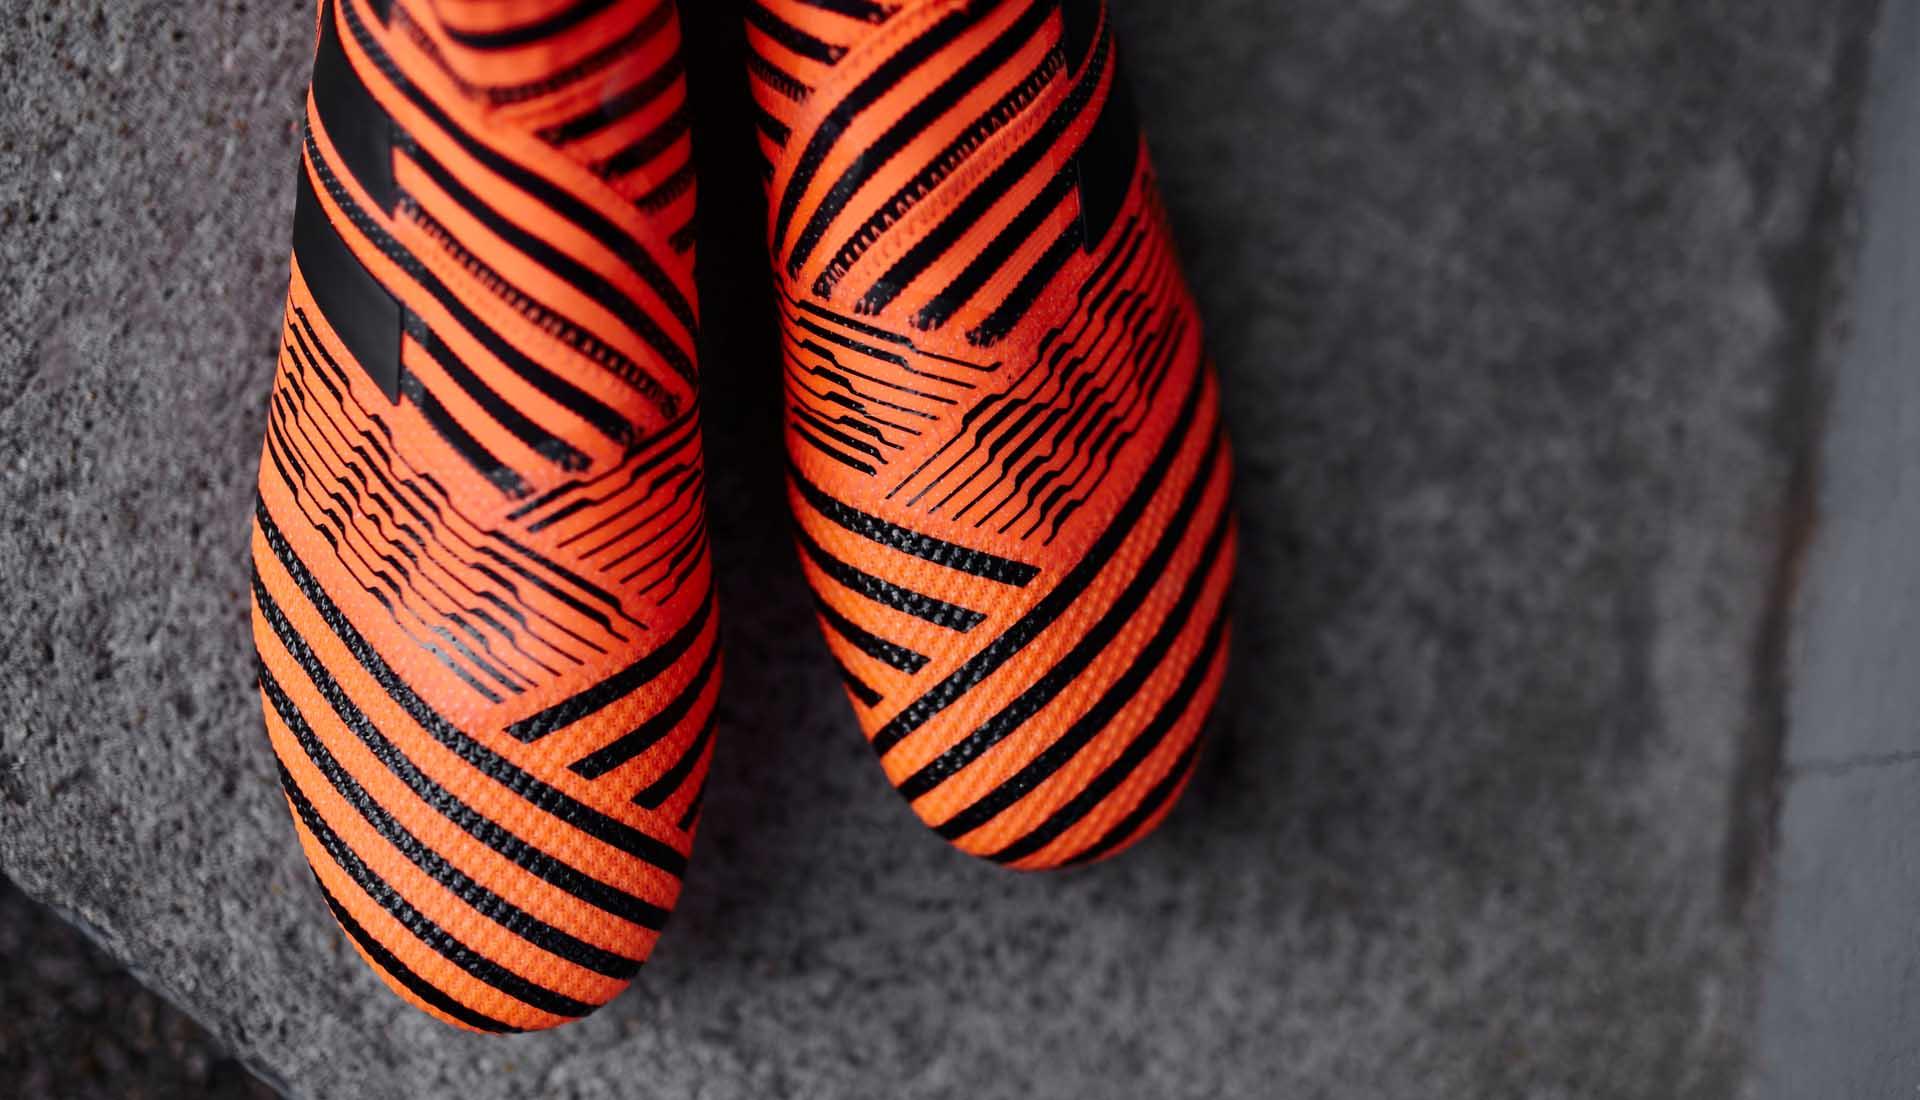 Adidas Nemeziz 17+ 360Agility Pyro Storm